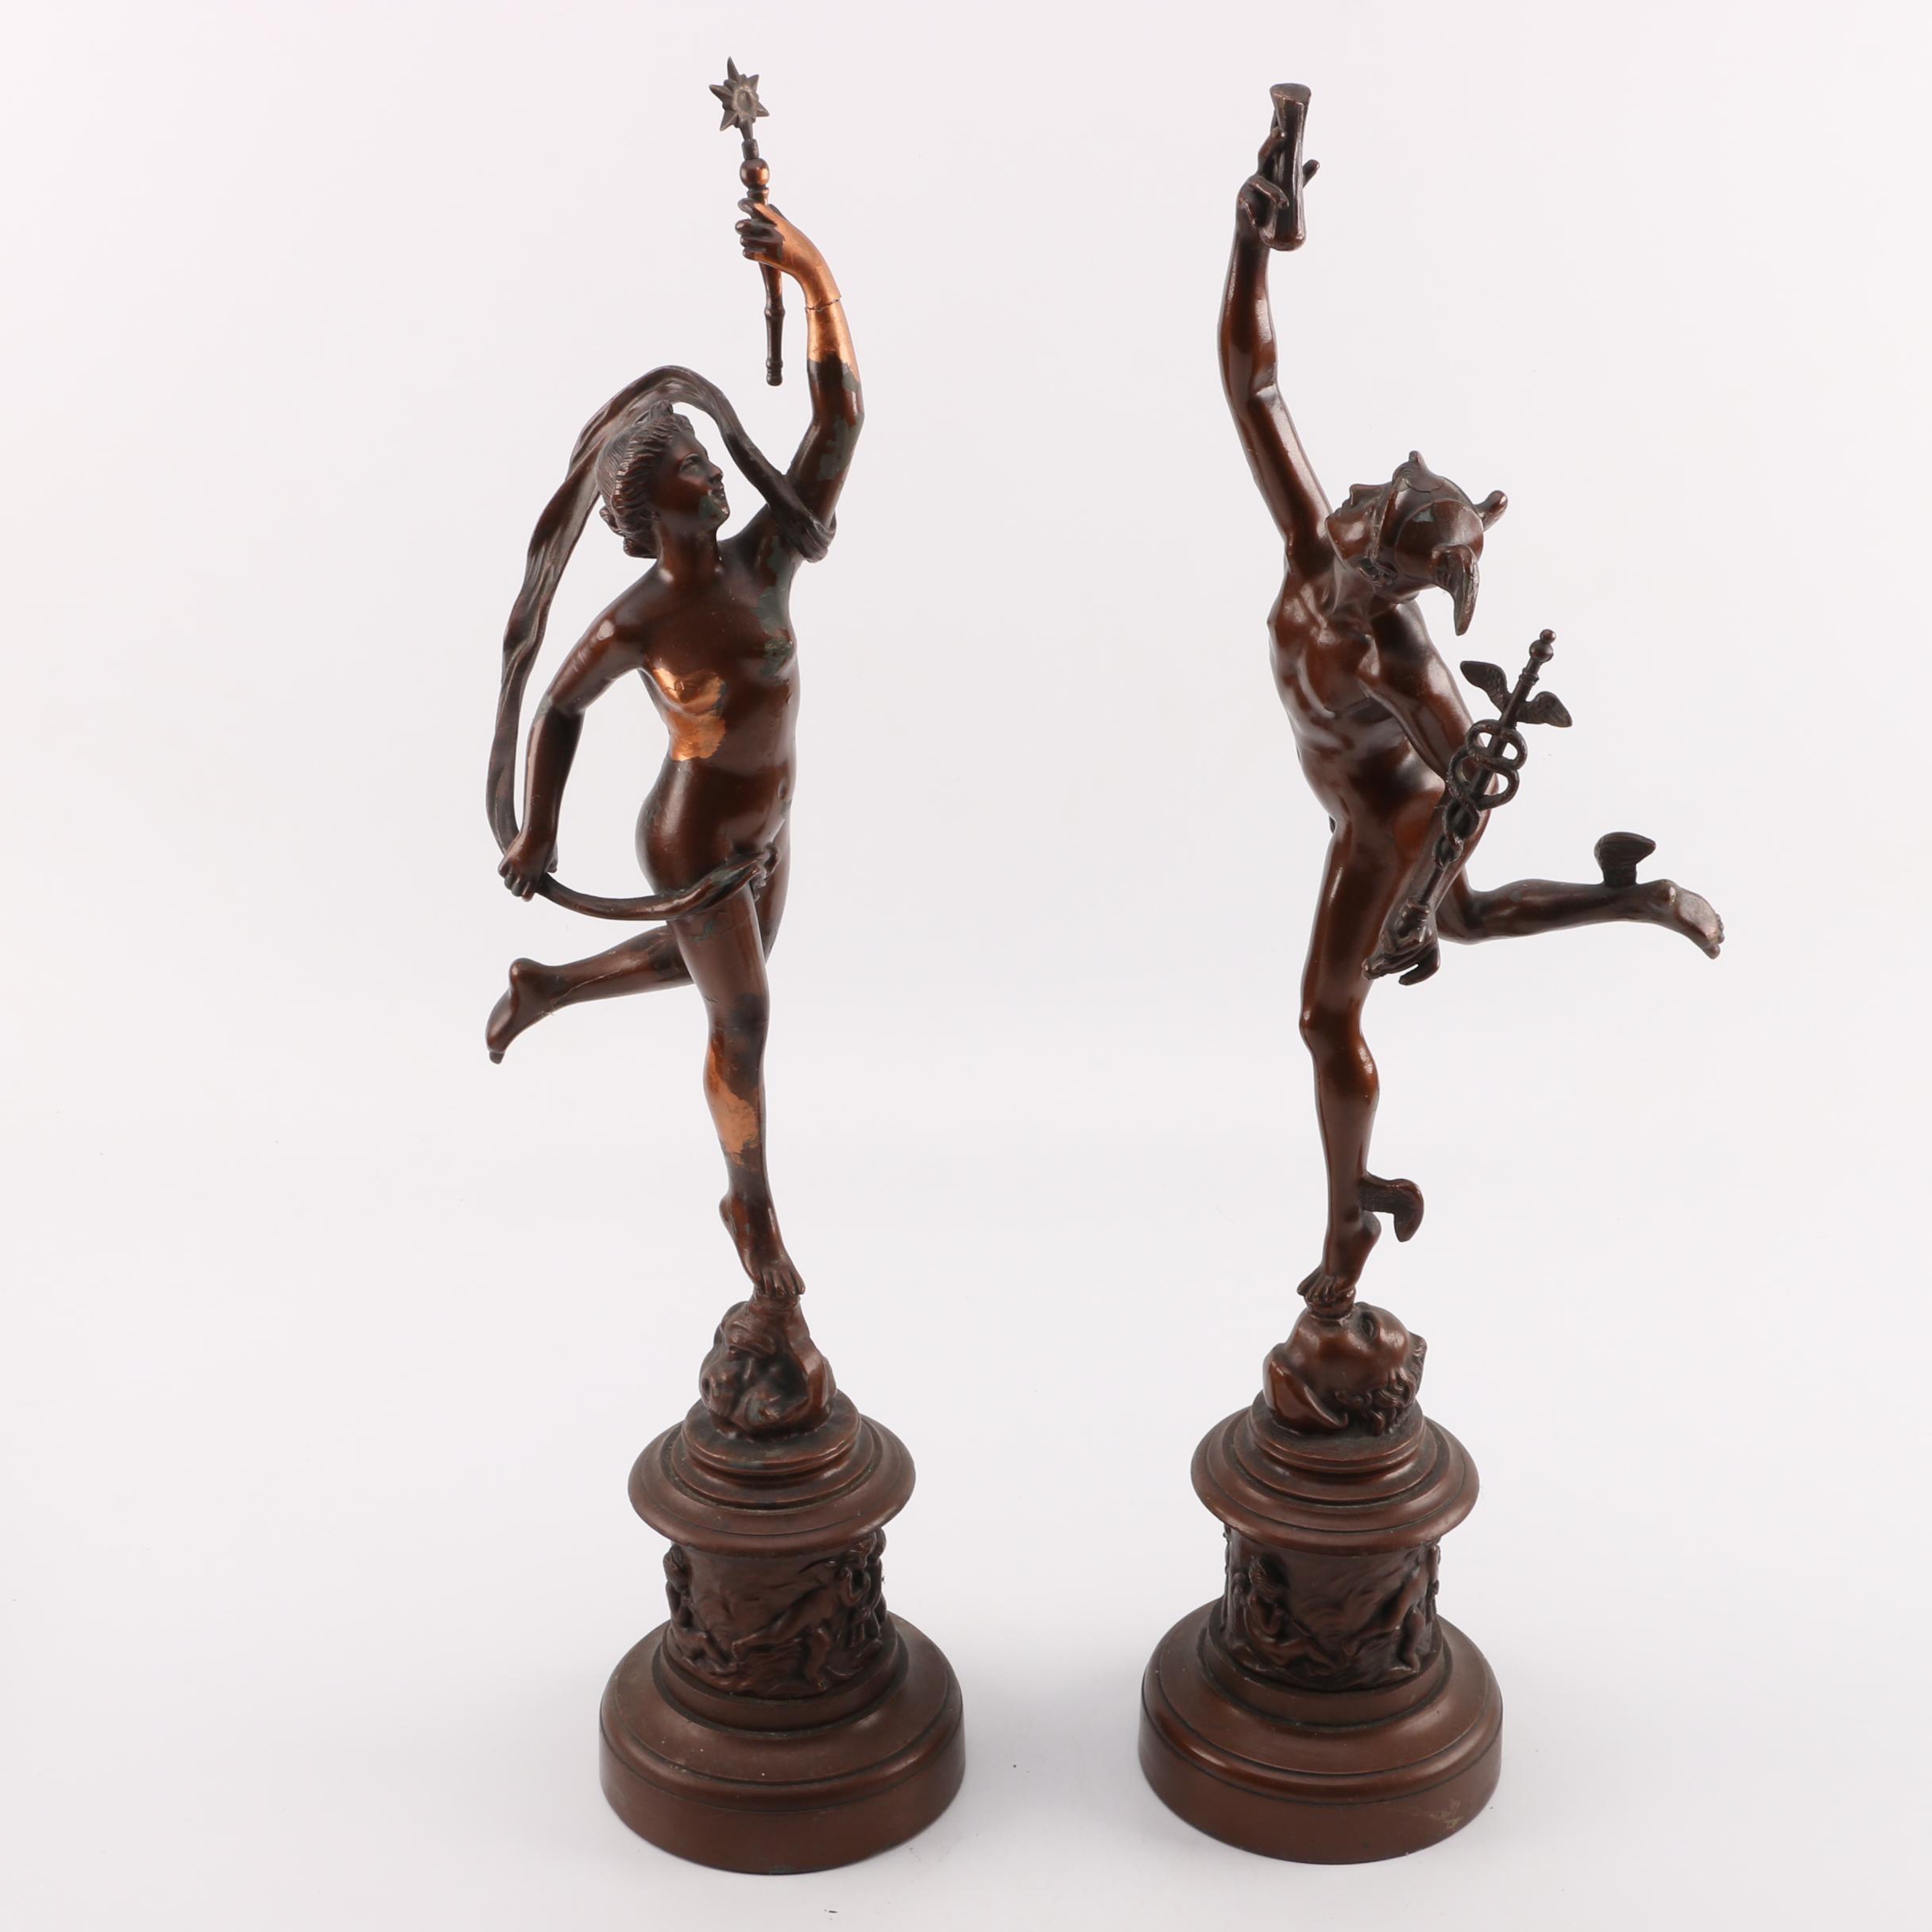 Mercury and Fortuna Bronze Sculptures after Jean de Bologna